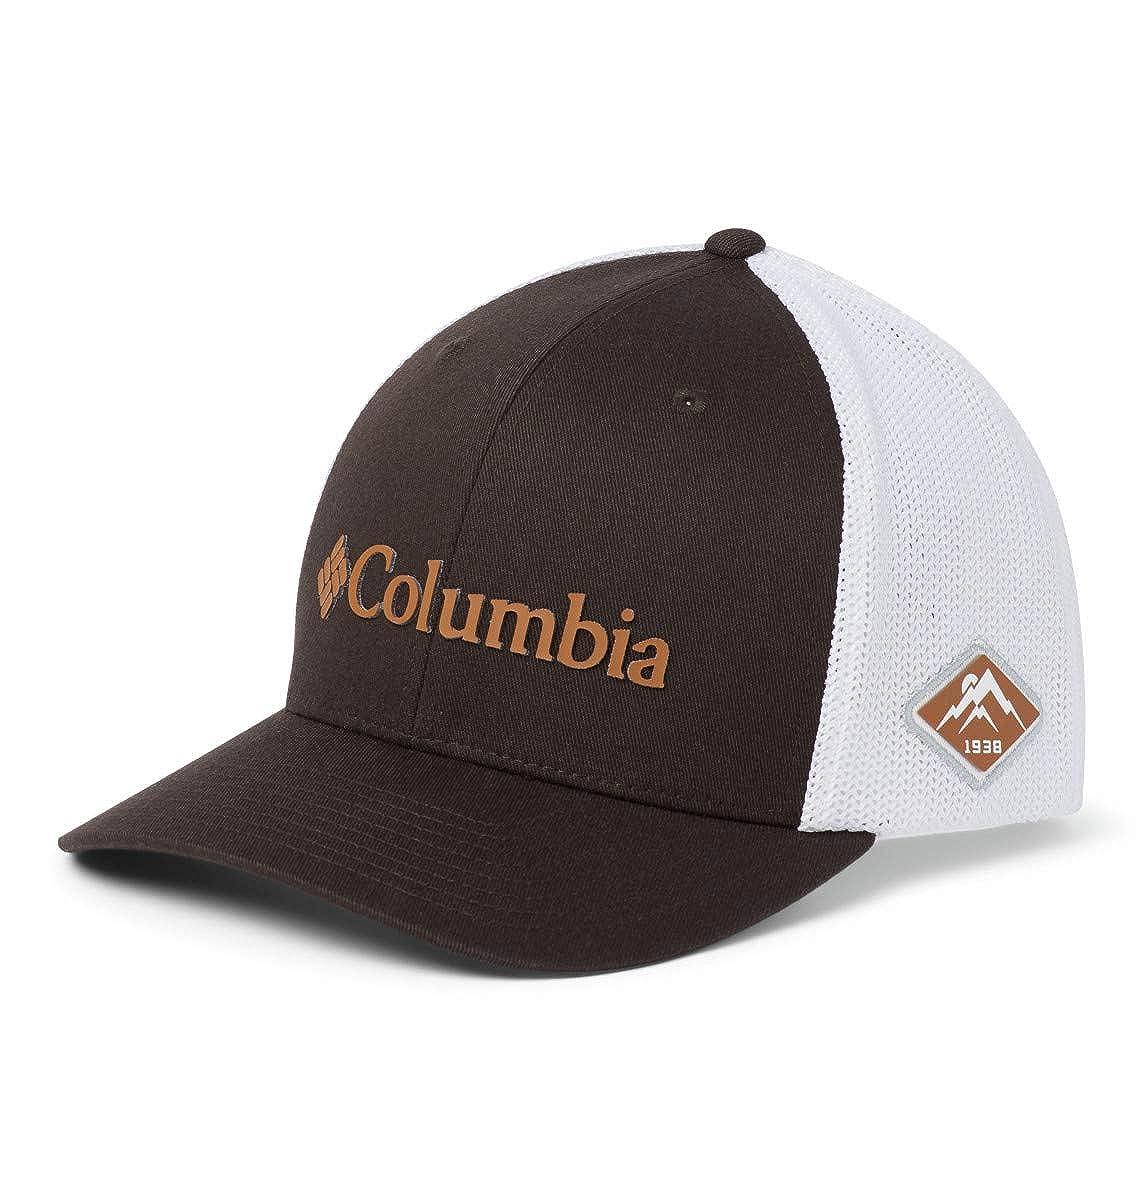 Columbia Mens Mesh Ballcap